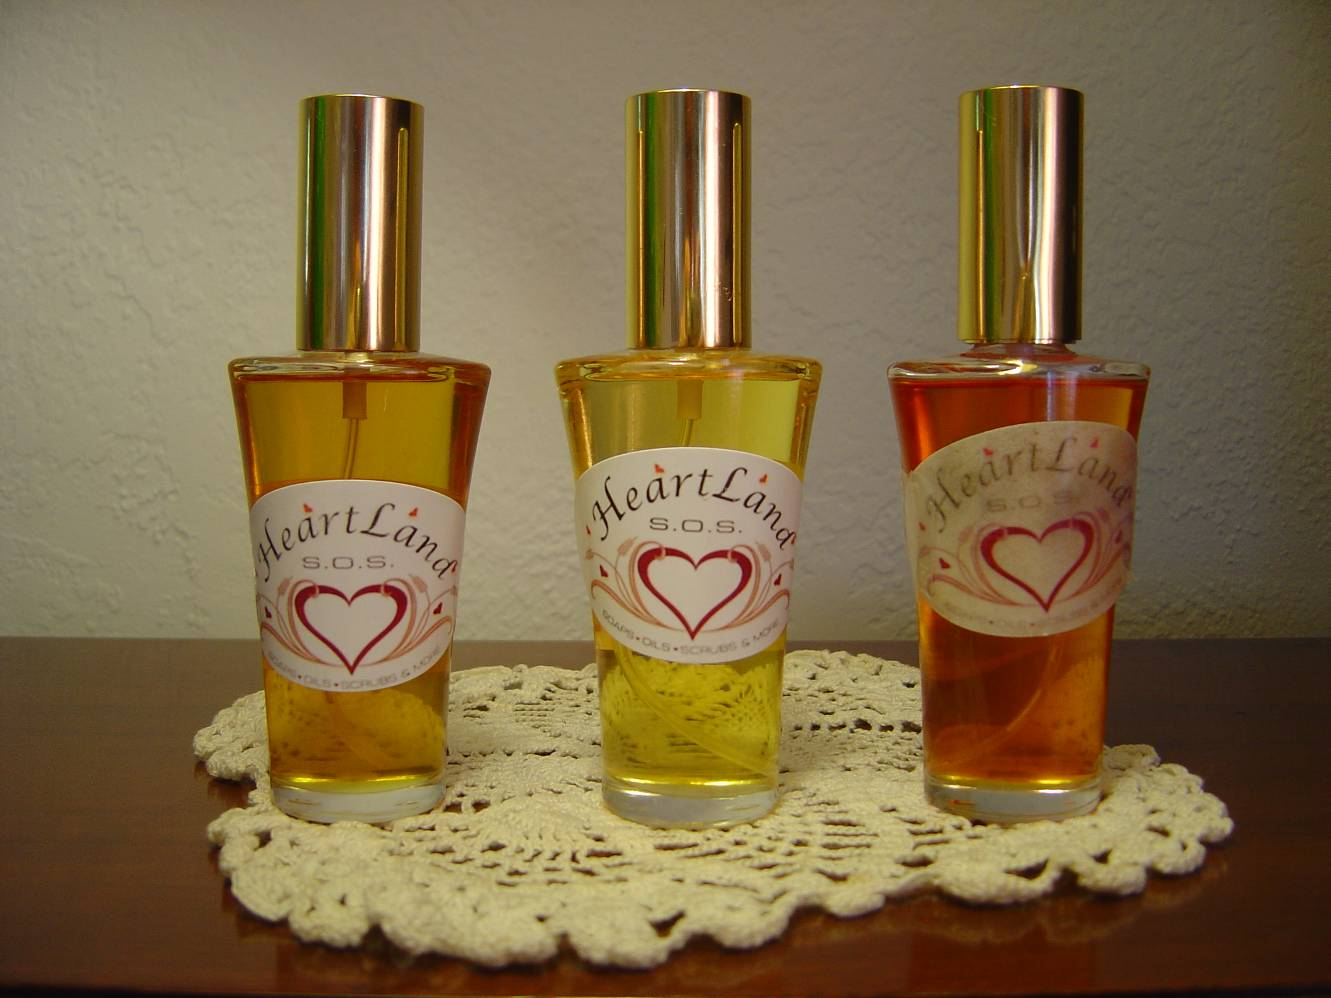 Heartland S.O.S. Perfumes.jpeg